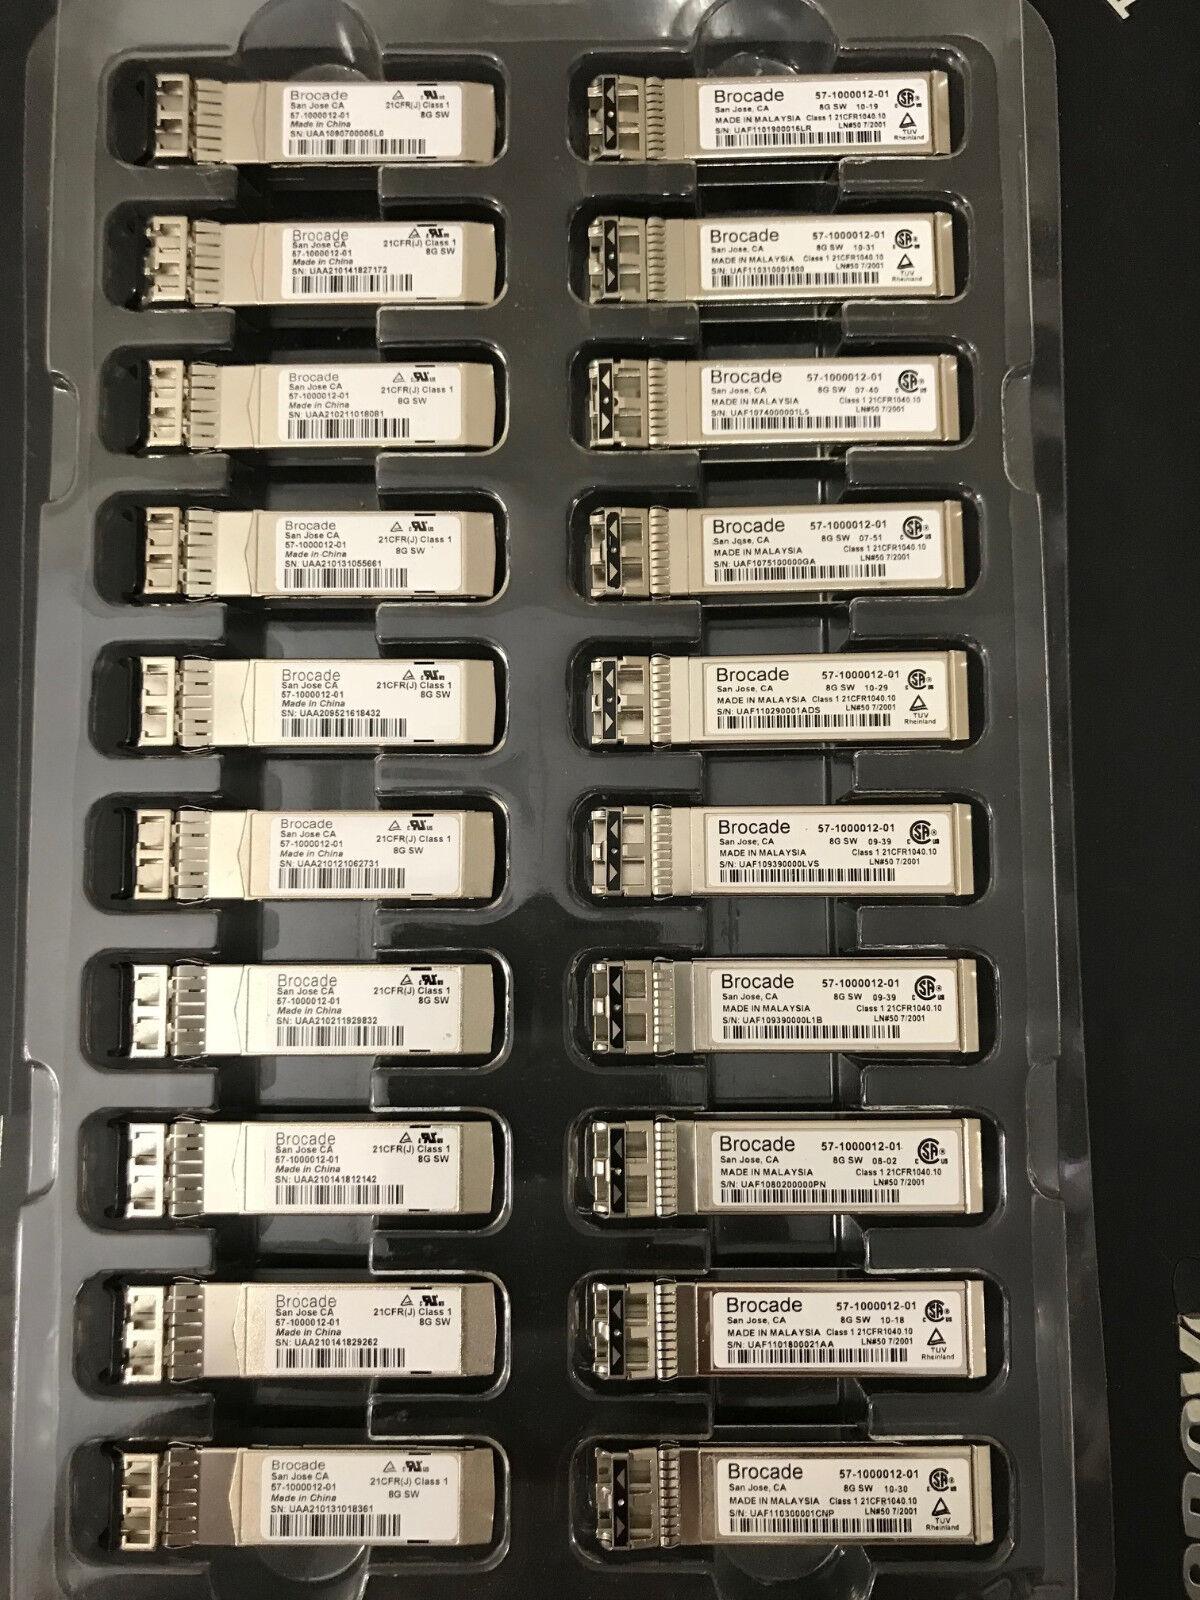 FC Transceiver XBR-000147 Lot of 2 Brocade 57-1000012-01 8Gb SWL 850nm SFP